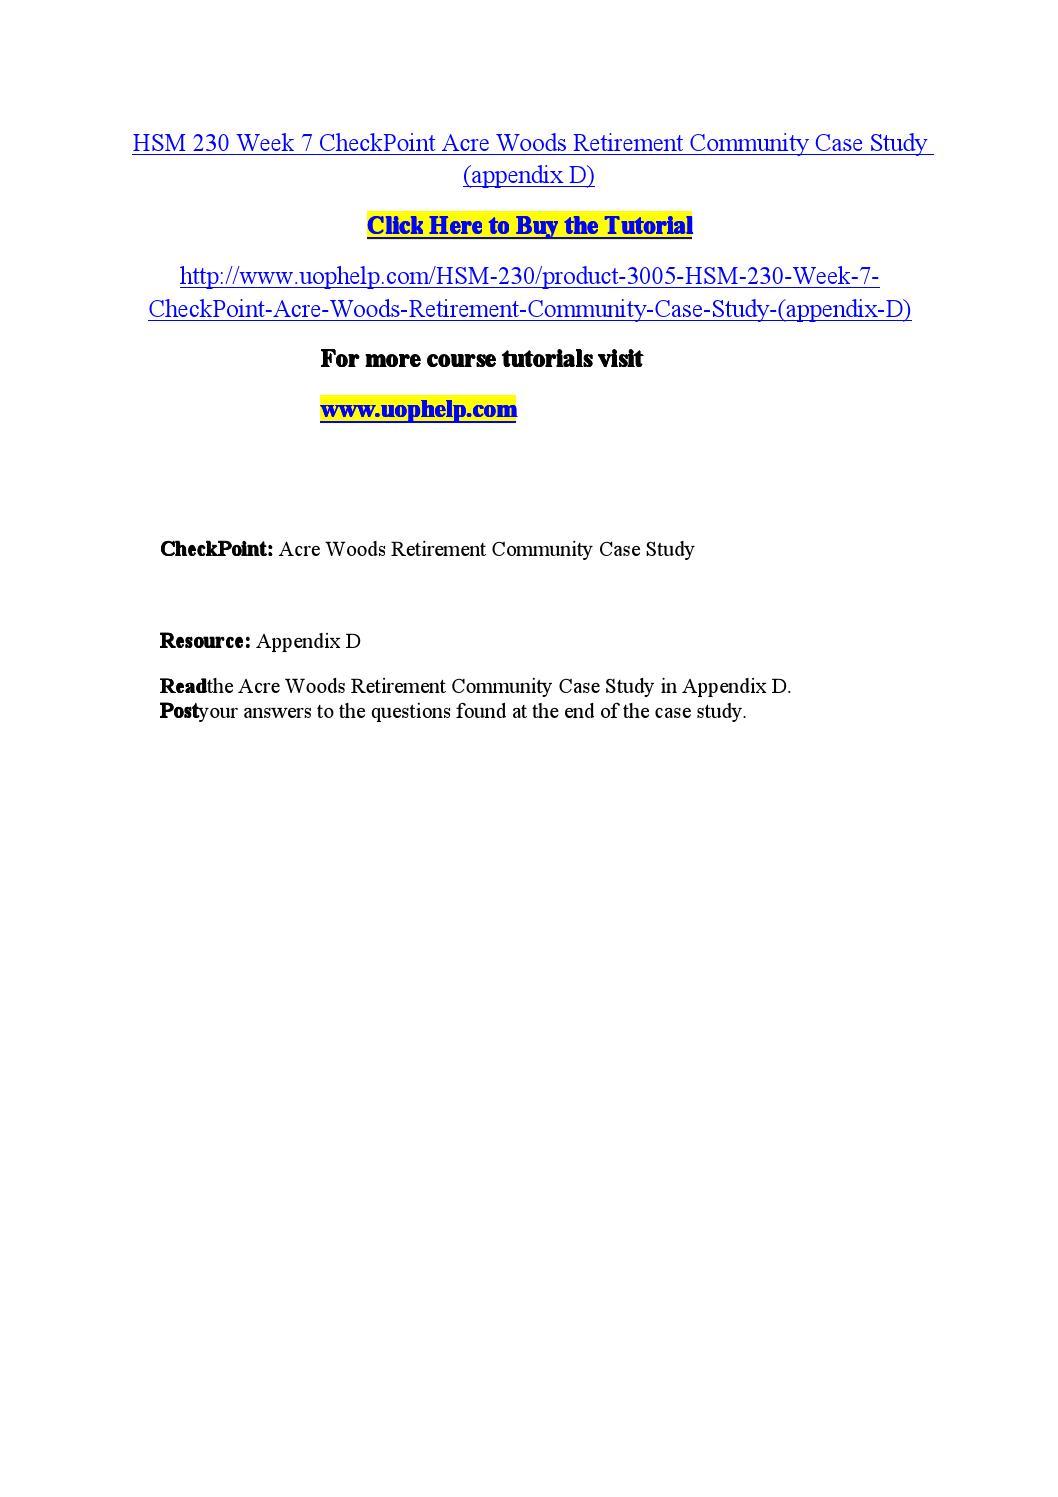 Irene Schaffer's Website